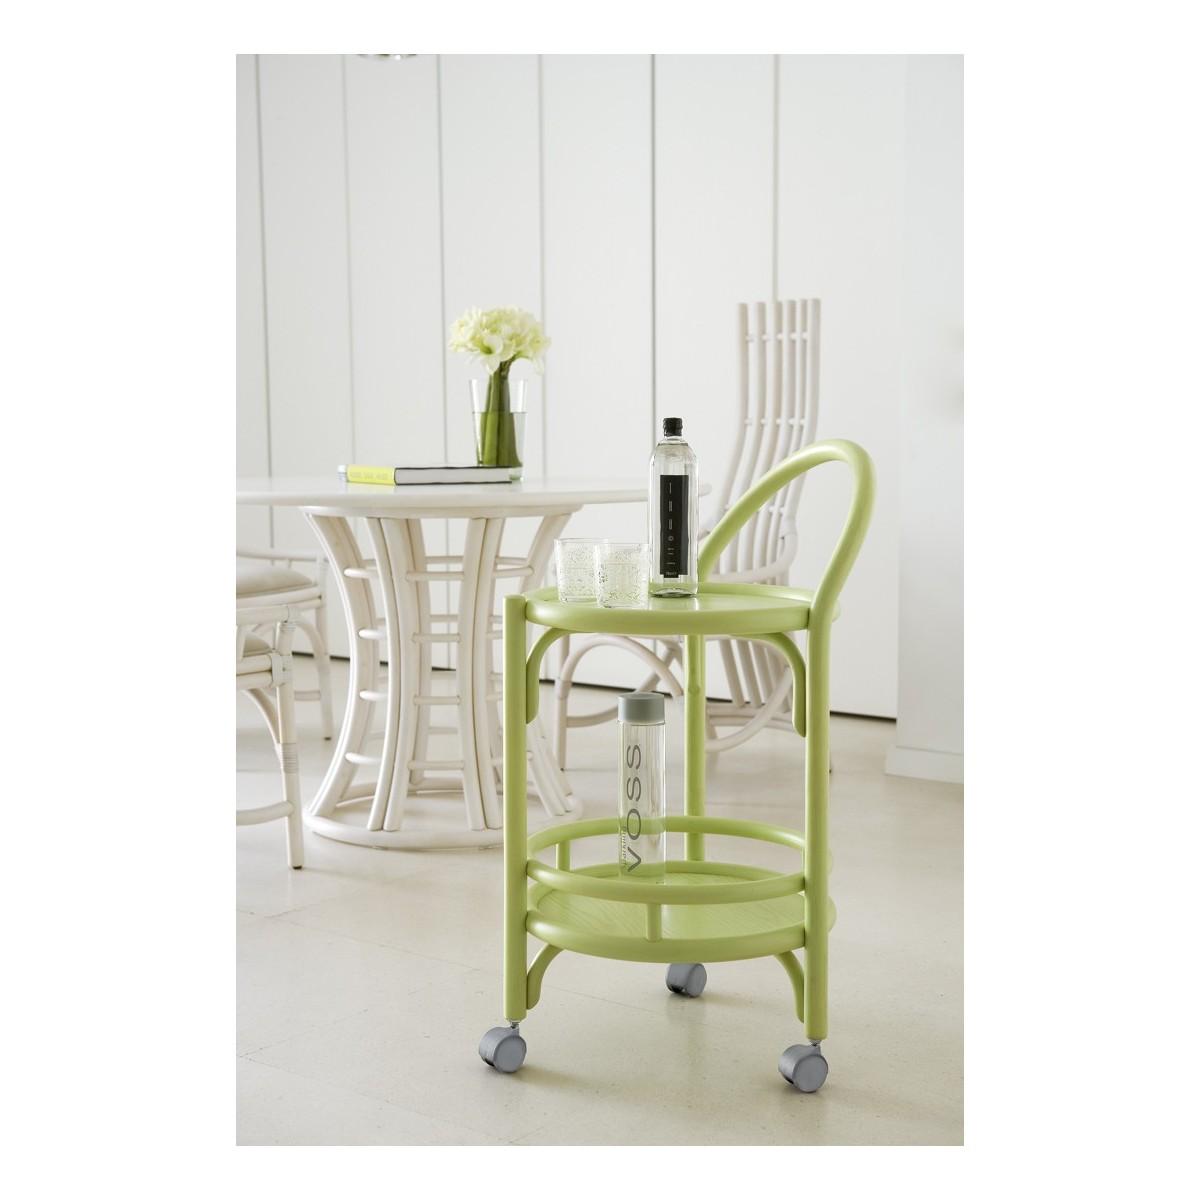 table roulante desserte de table en rotin. Black Bedroom Furniture Sets. Home Design Ideas